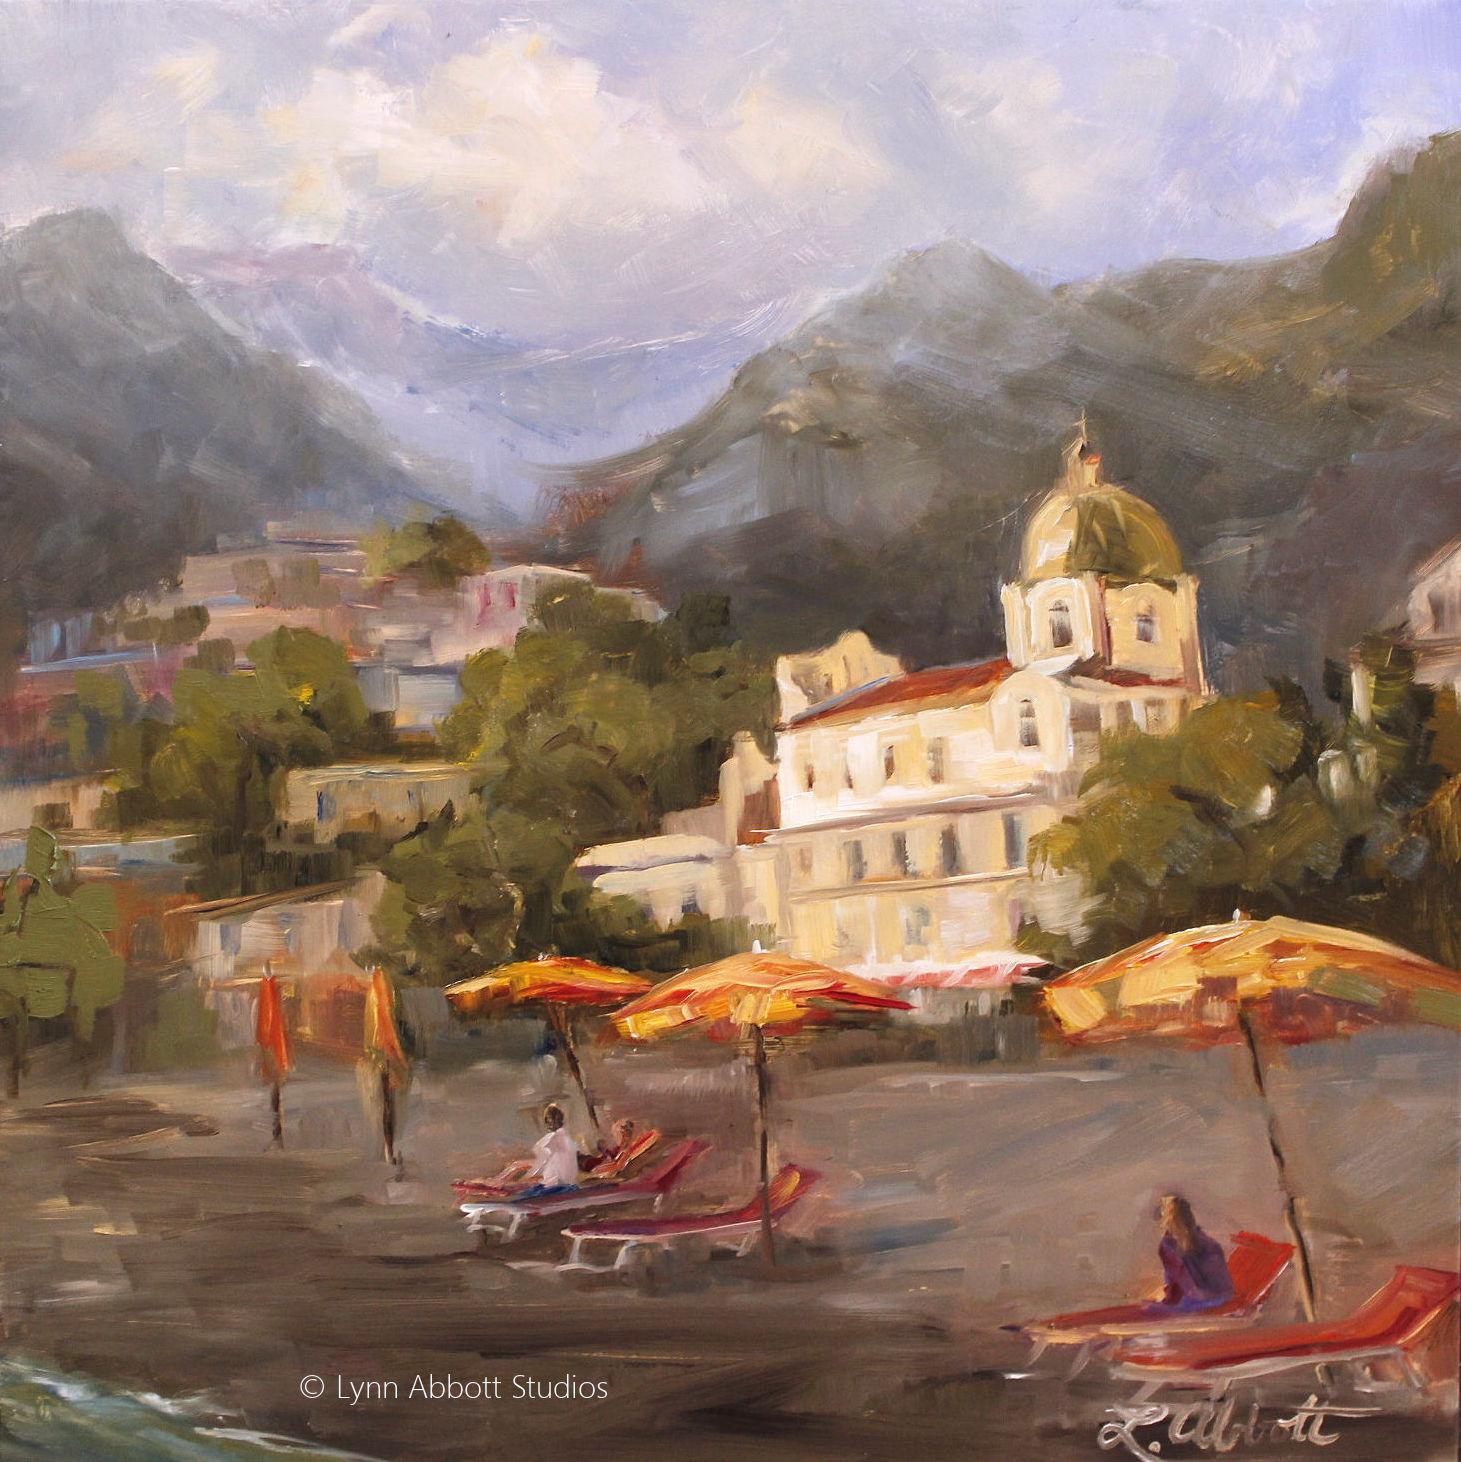 Afternoon in Positano, Lynn Abbott